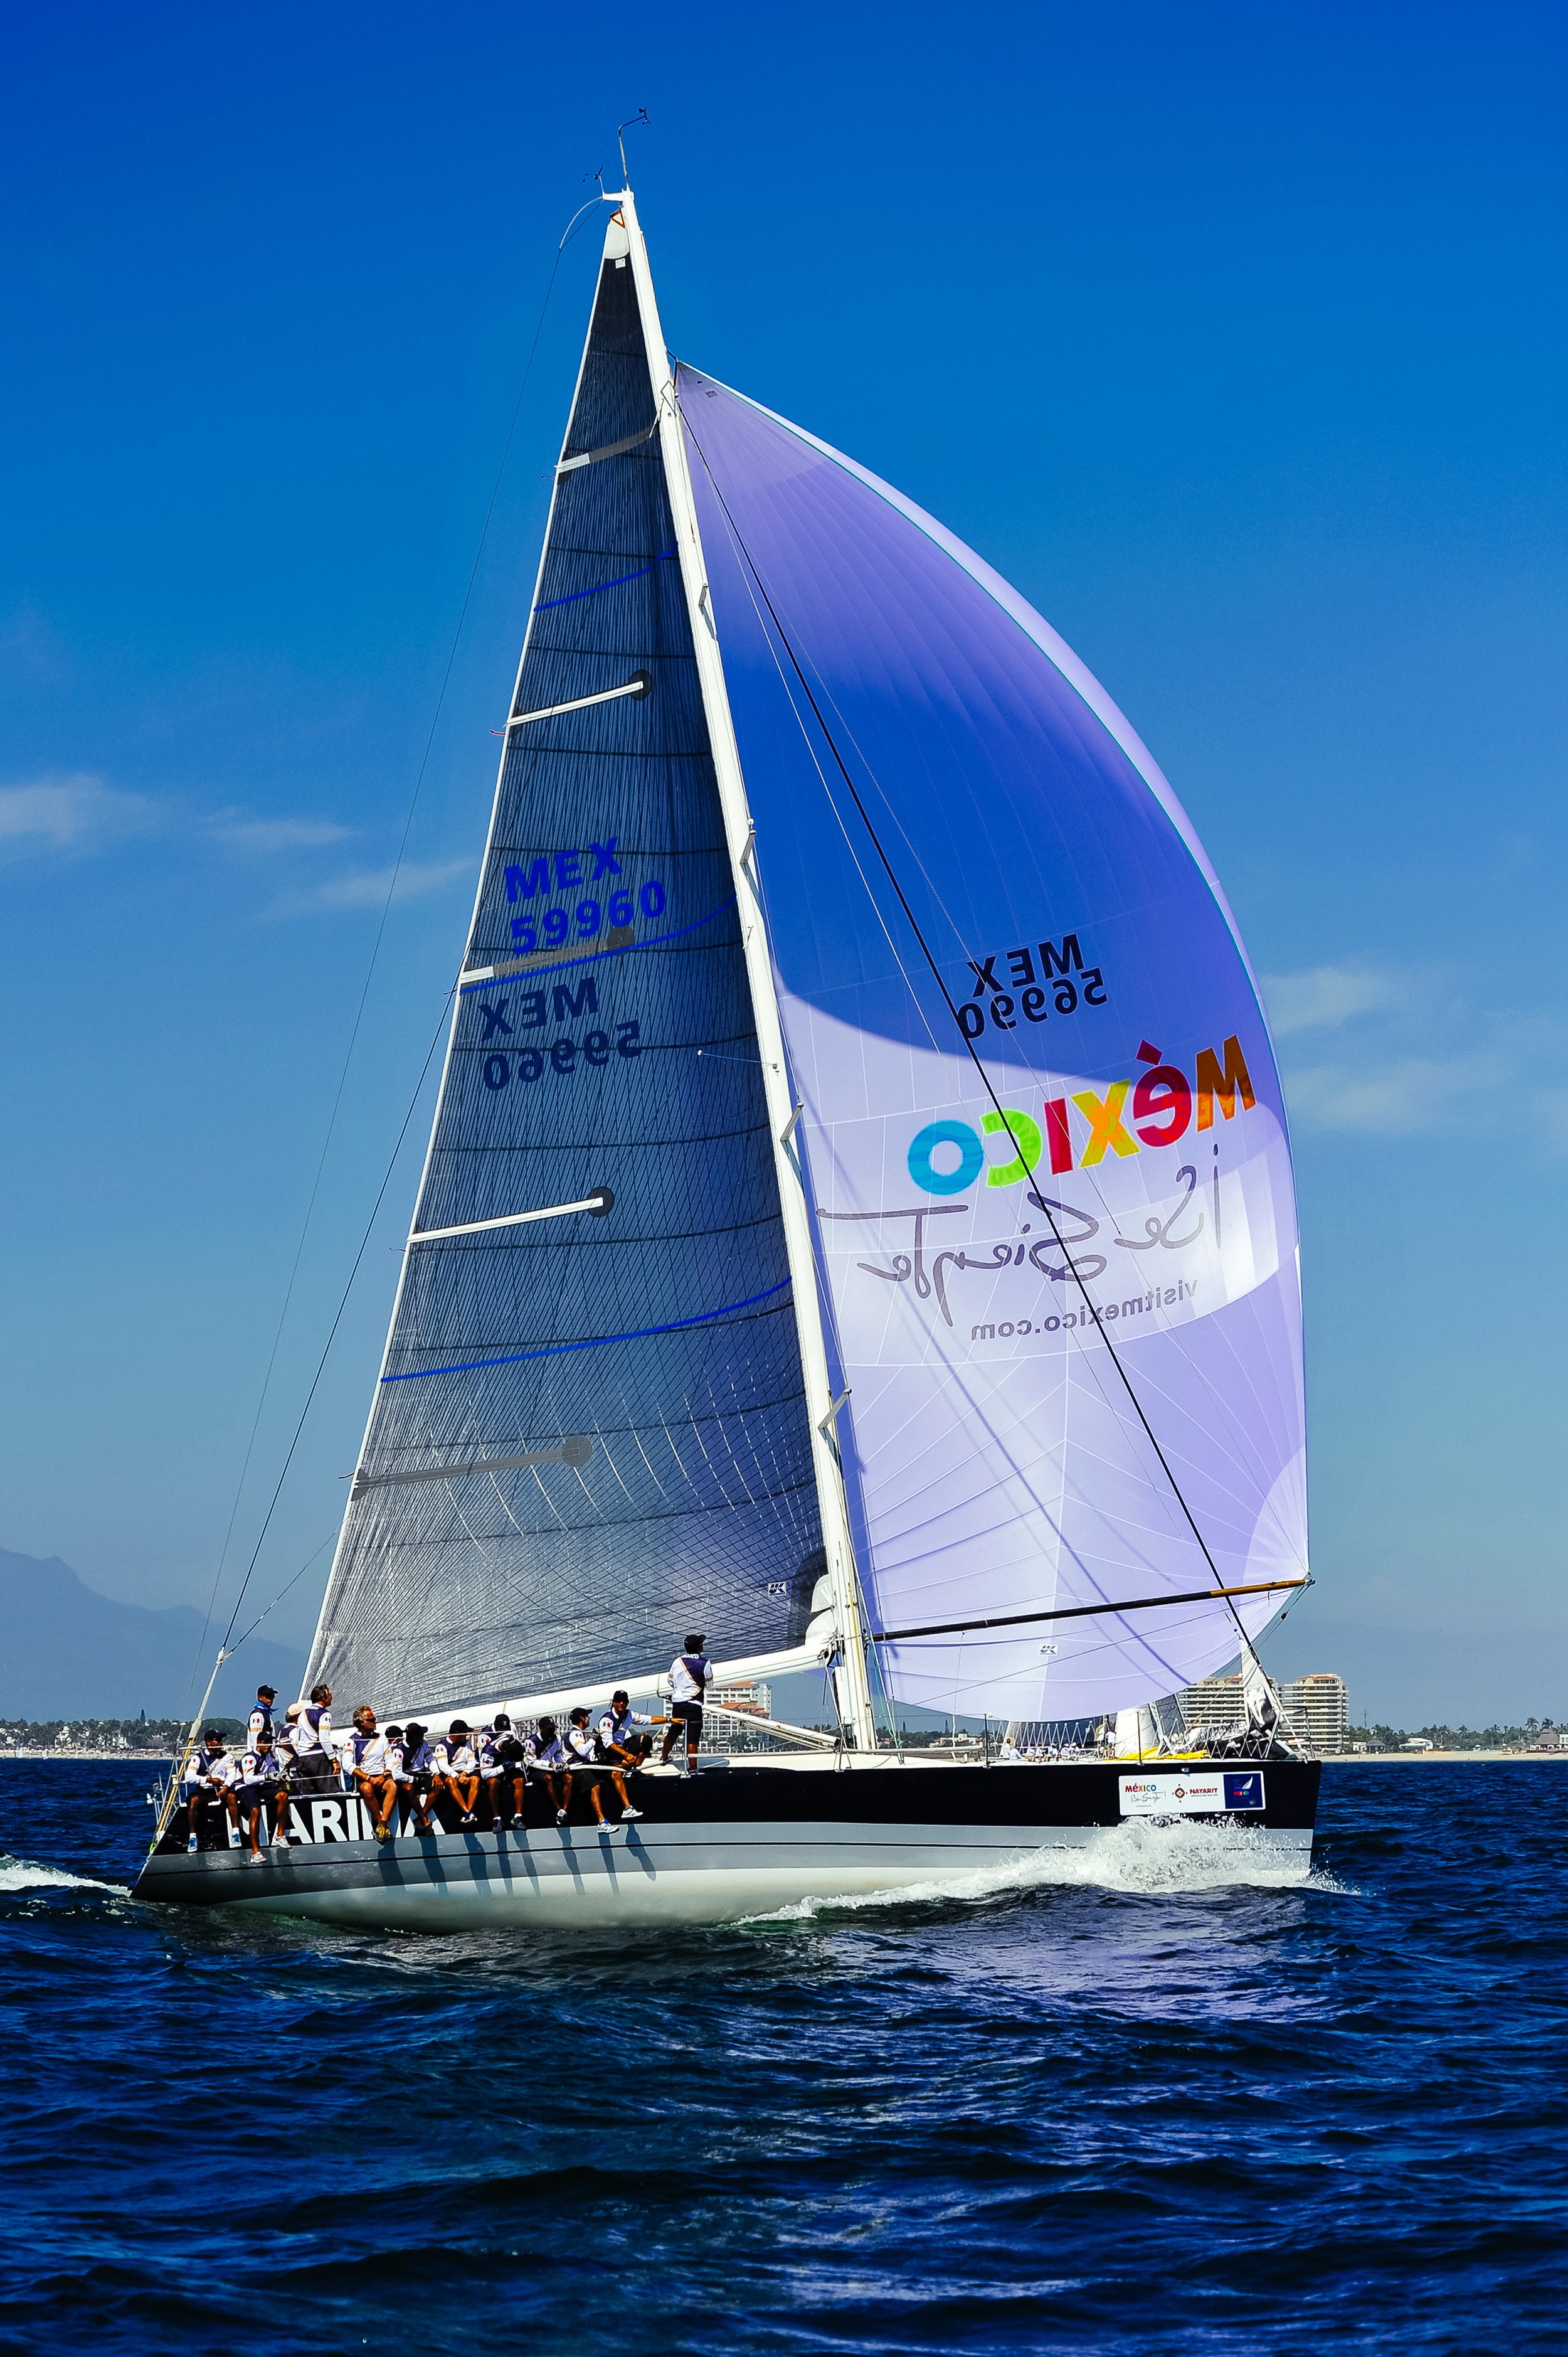 UK Sailmakers NM46 Marina